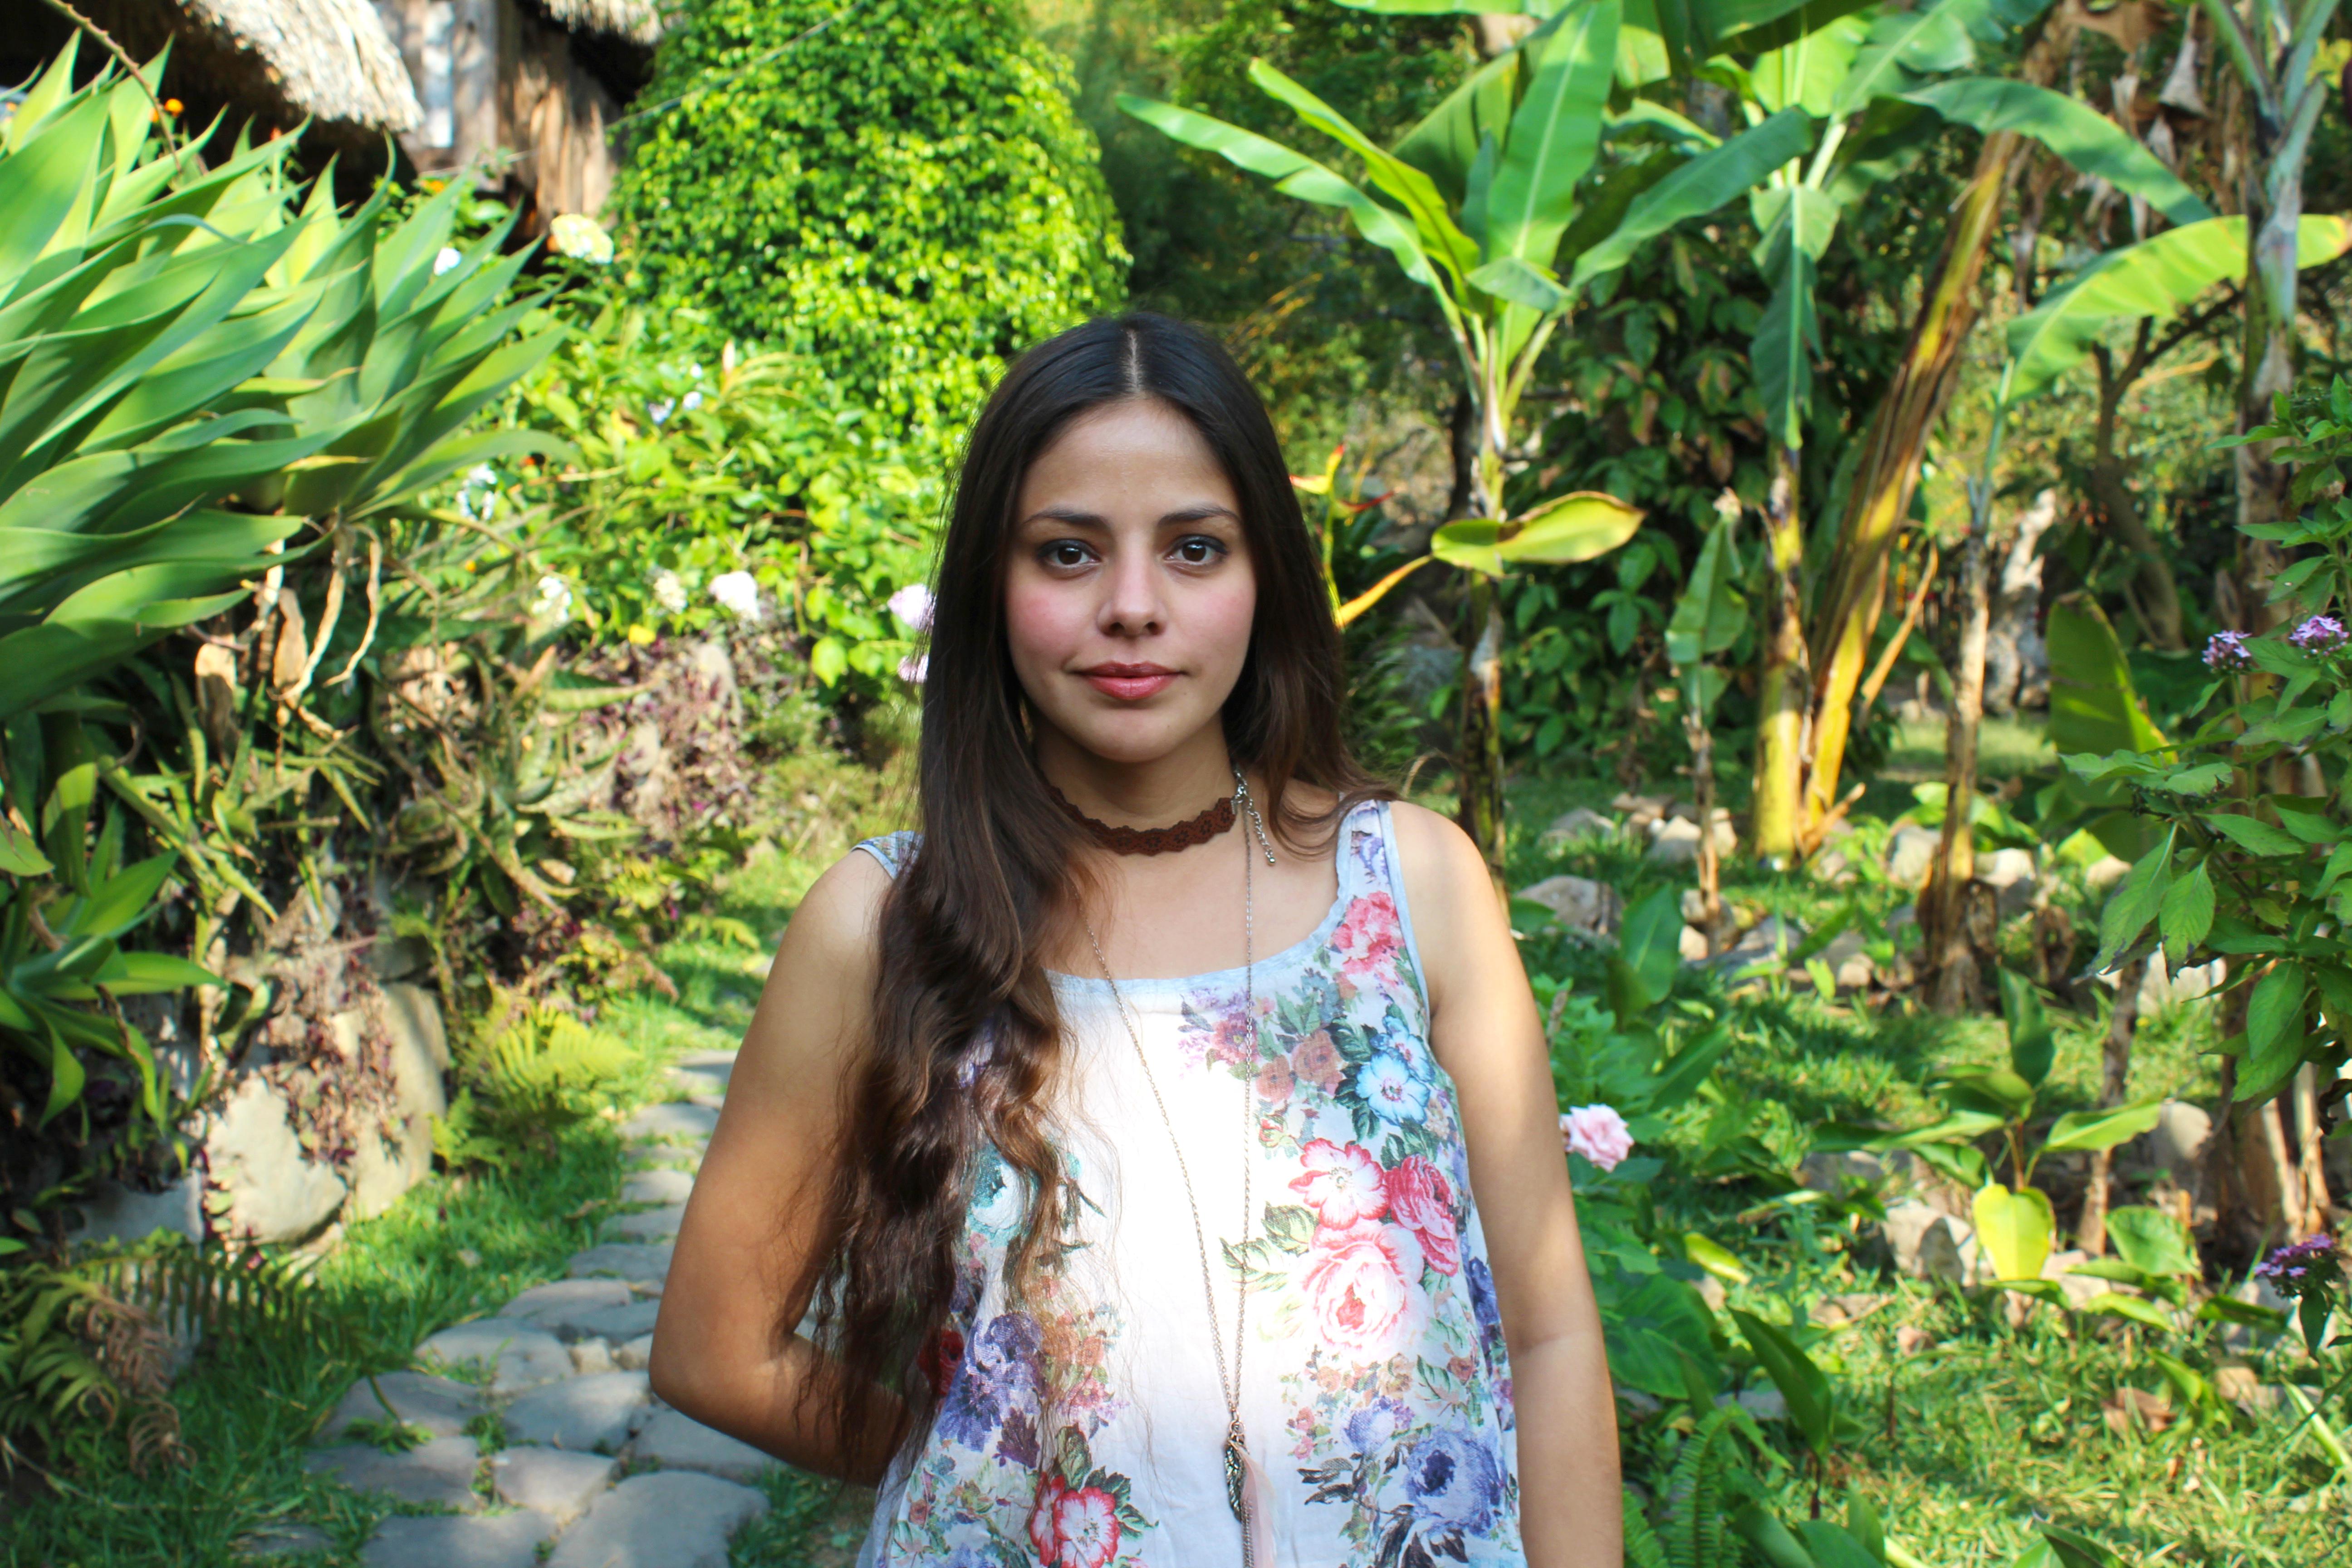 Carmen Maria Alvarado Benitez